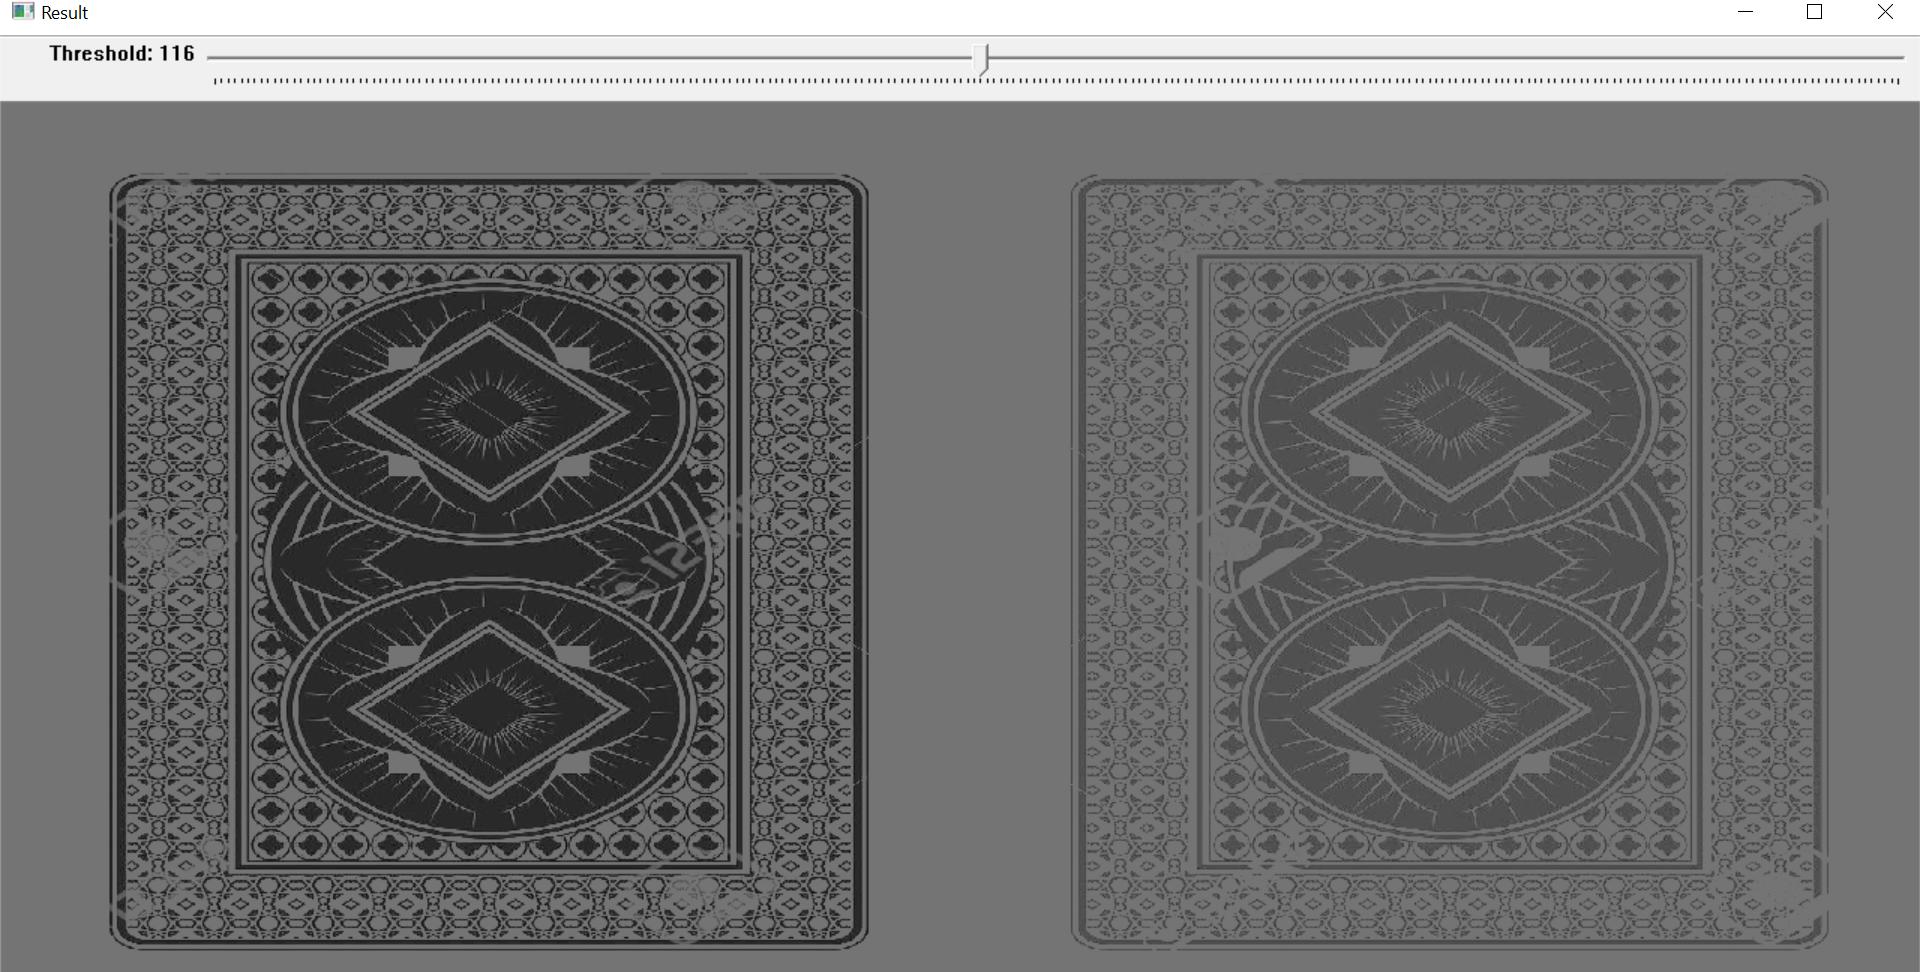 Opencv Segmentation Using Thresholding Geeksforgeeks